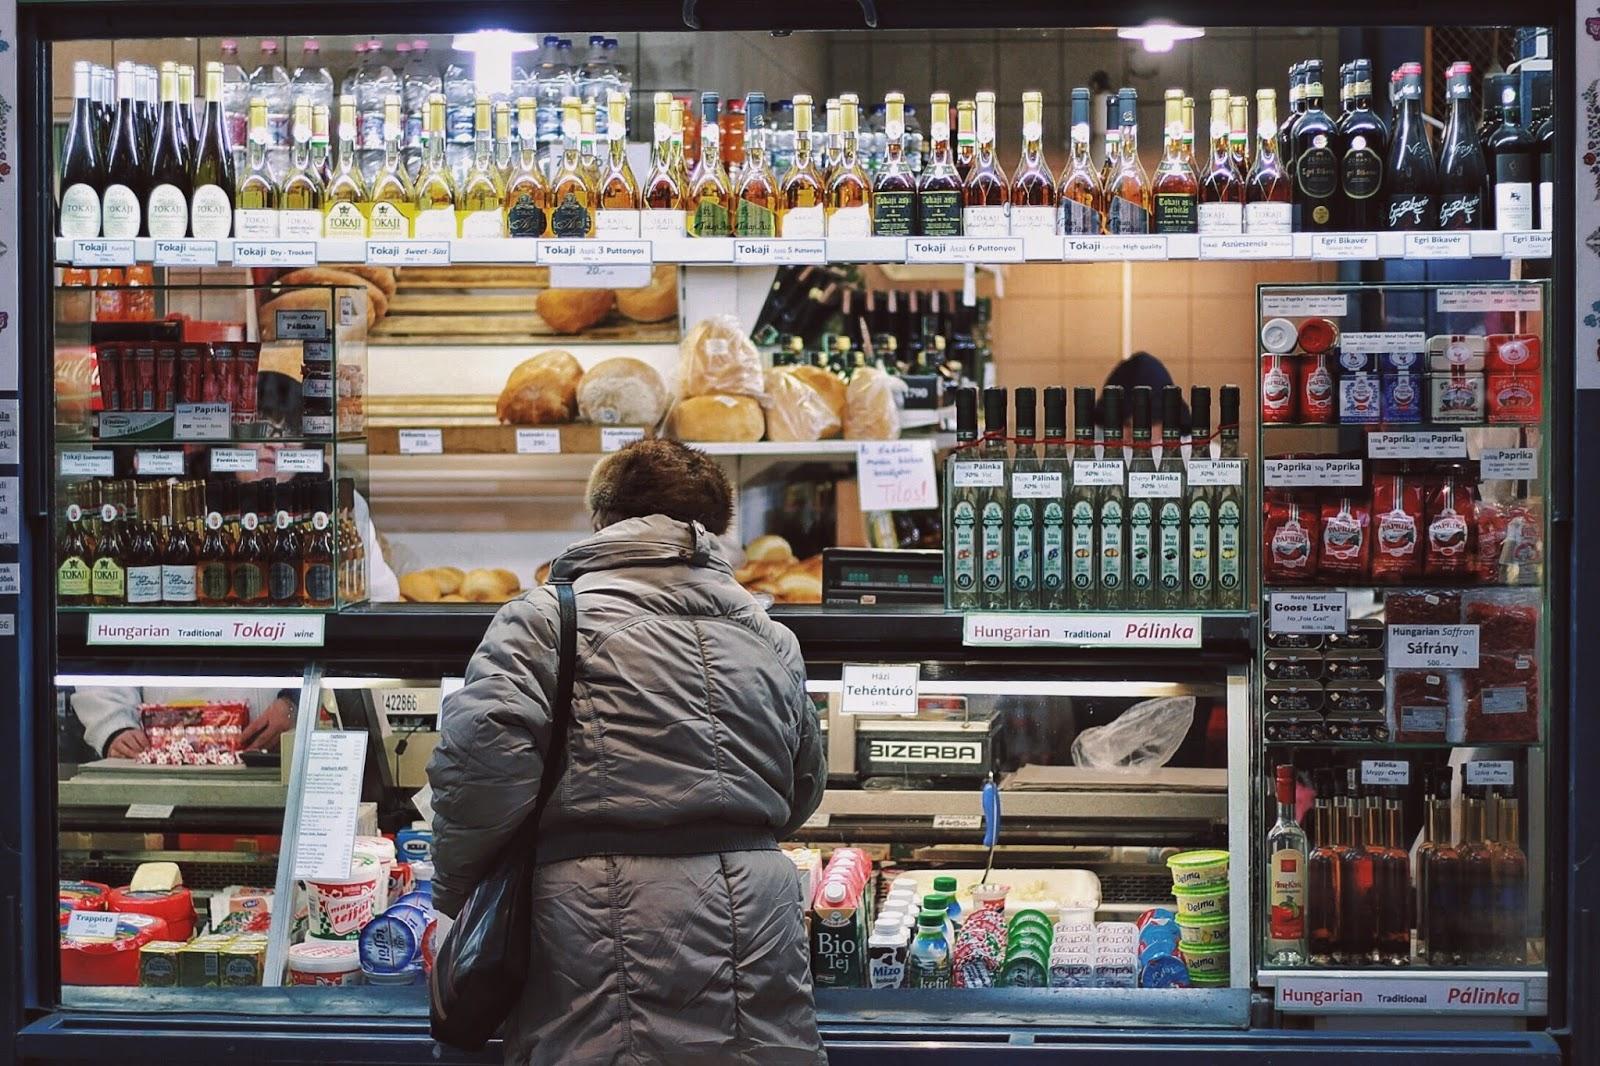 lifesthayle-budapest-great-market-hall-tradicional-stores.JPG